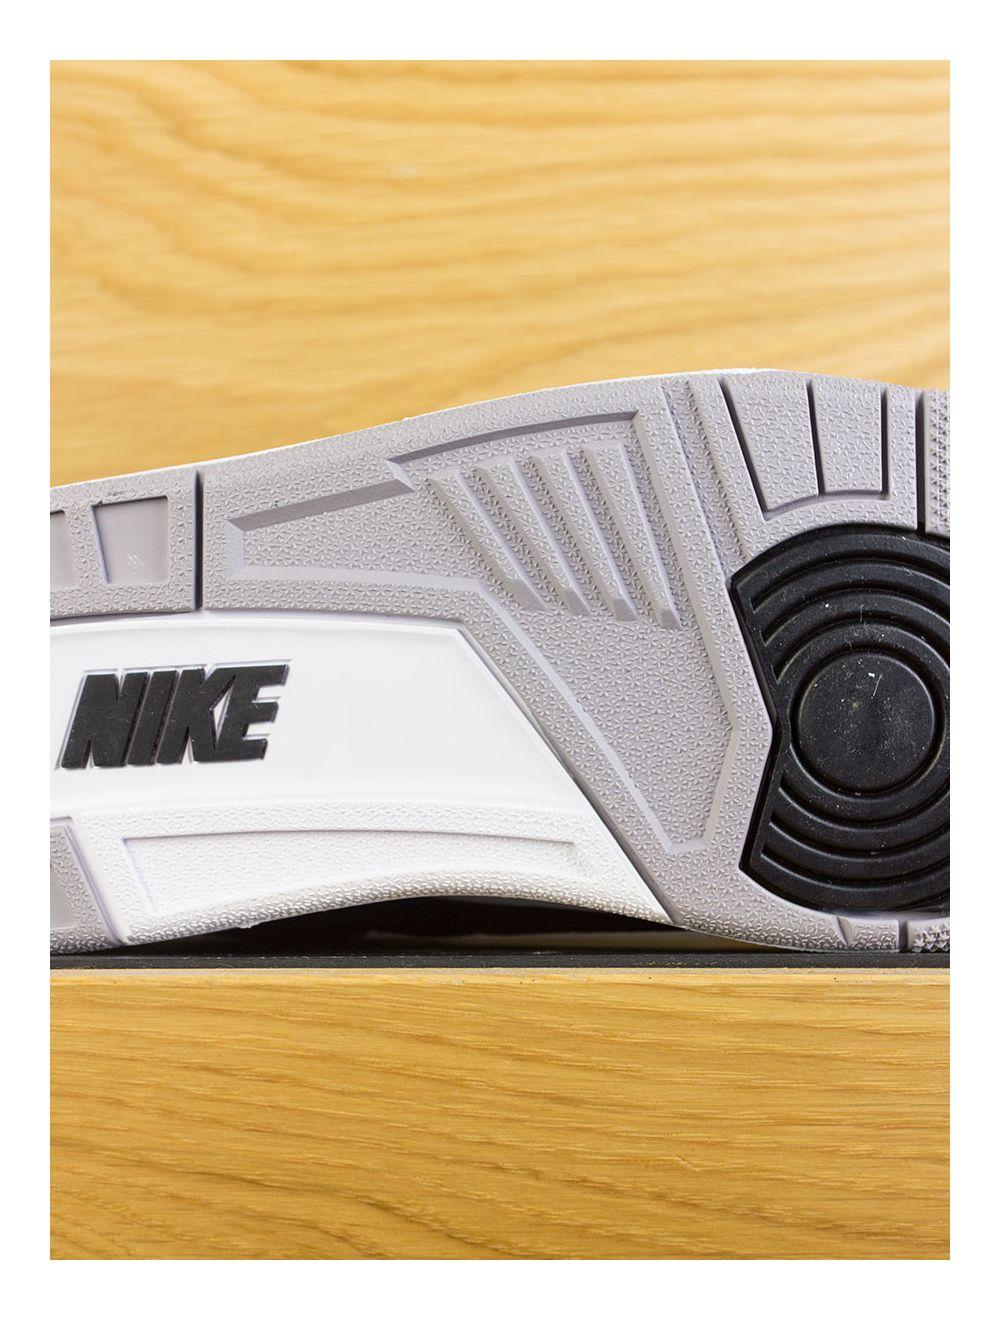 new style f9220 79941 Nike Air Jordan Retro 3 Tinker Hatfield - Black Cement Grey